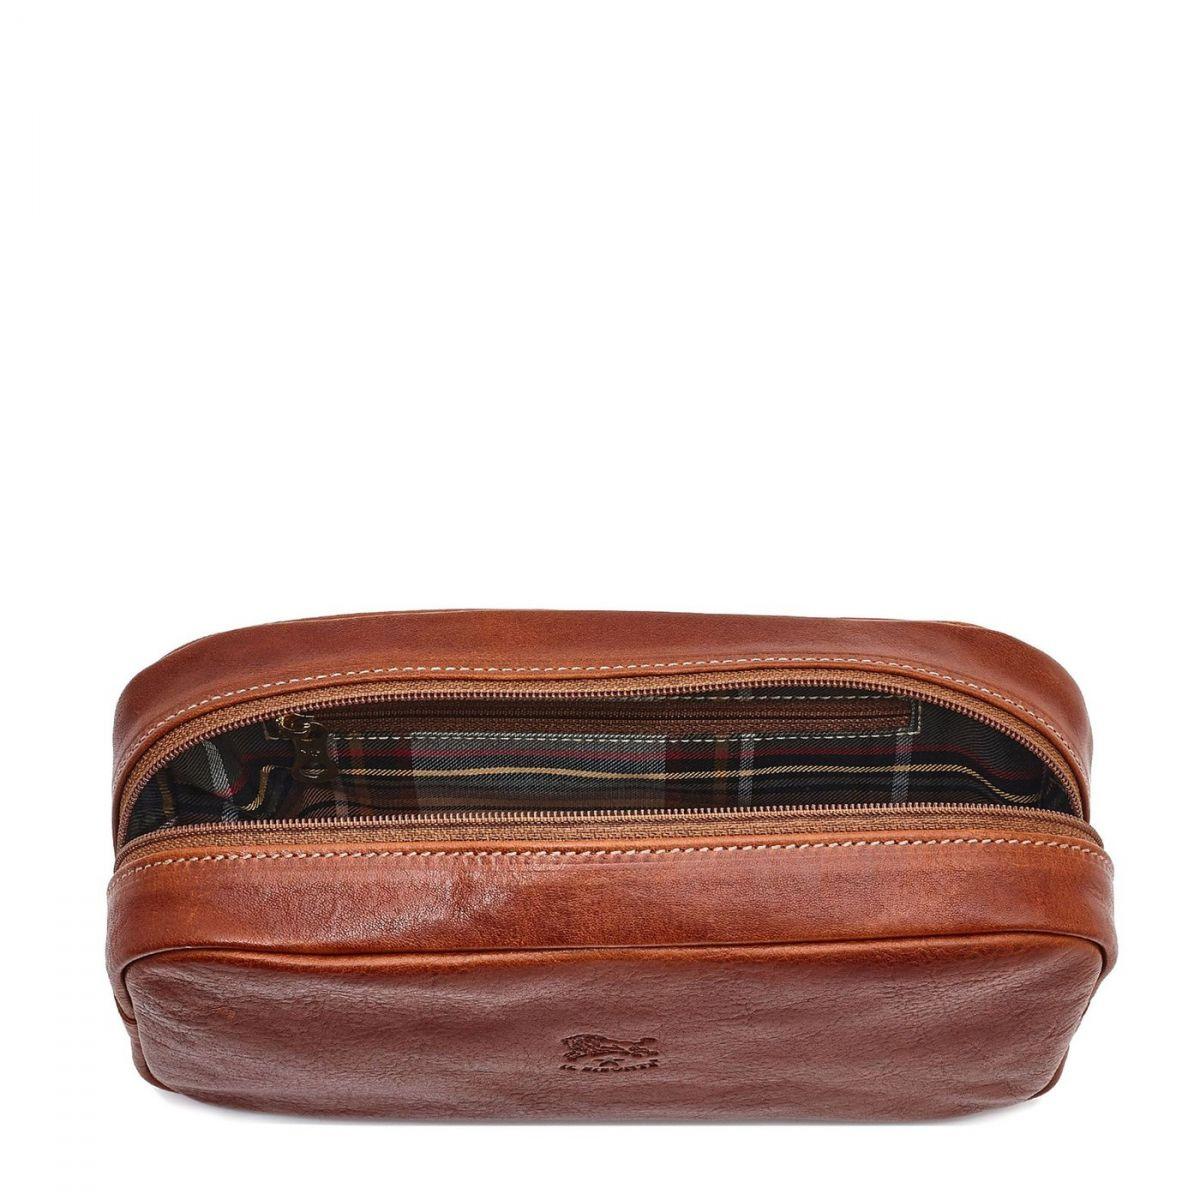 Men's Case Uffizi in Vintage Cowhide Leather SCA037 color Dark Brown Seppia | Details